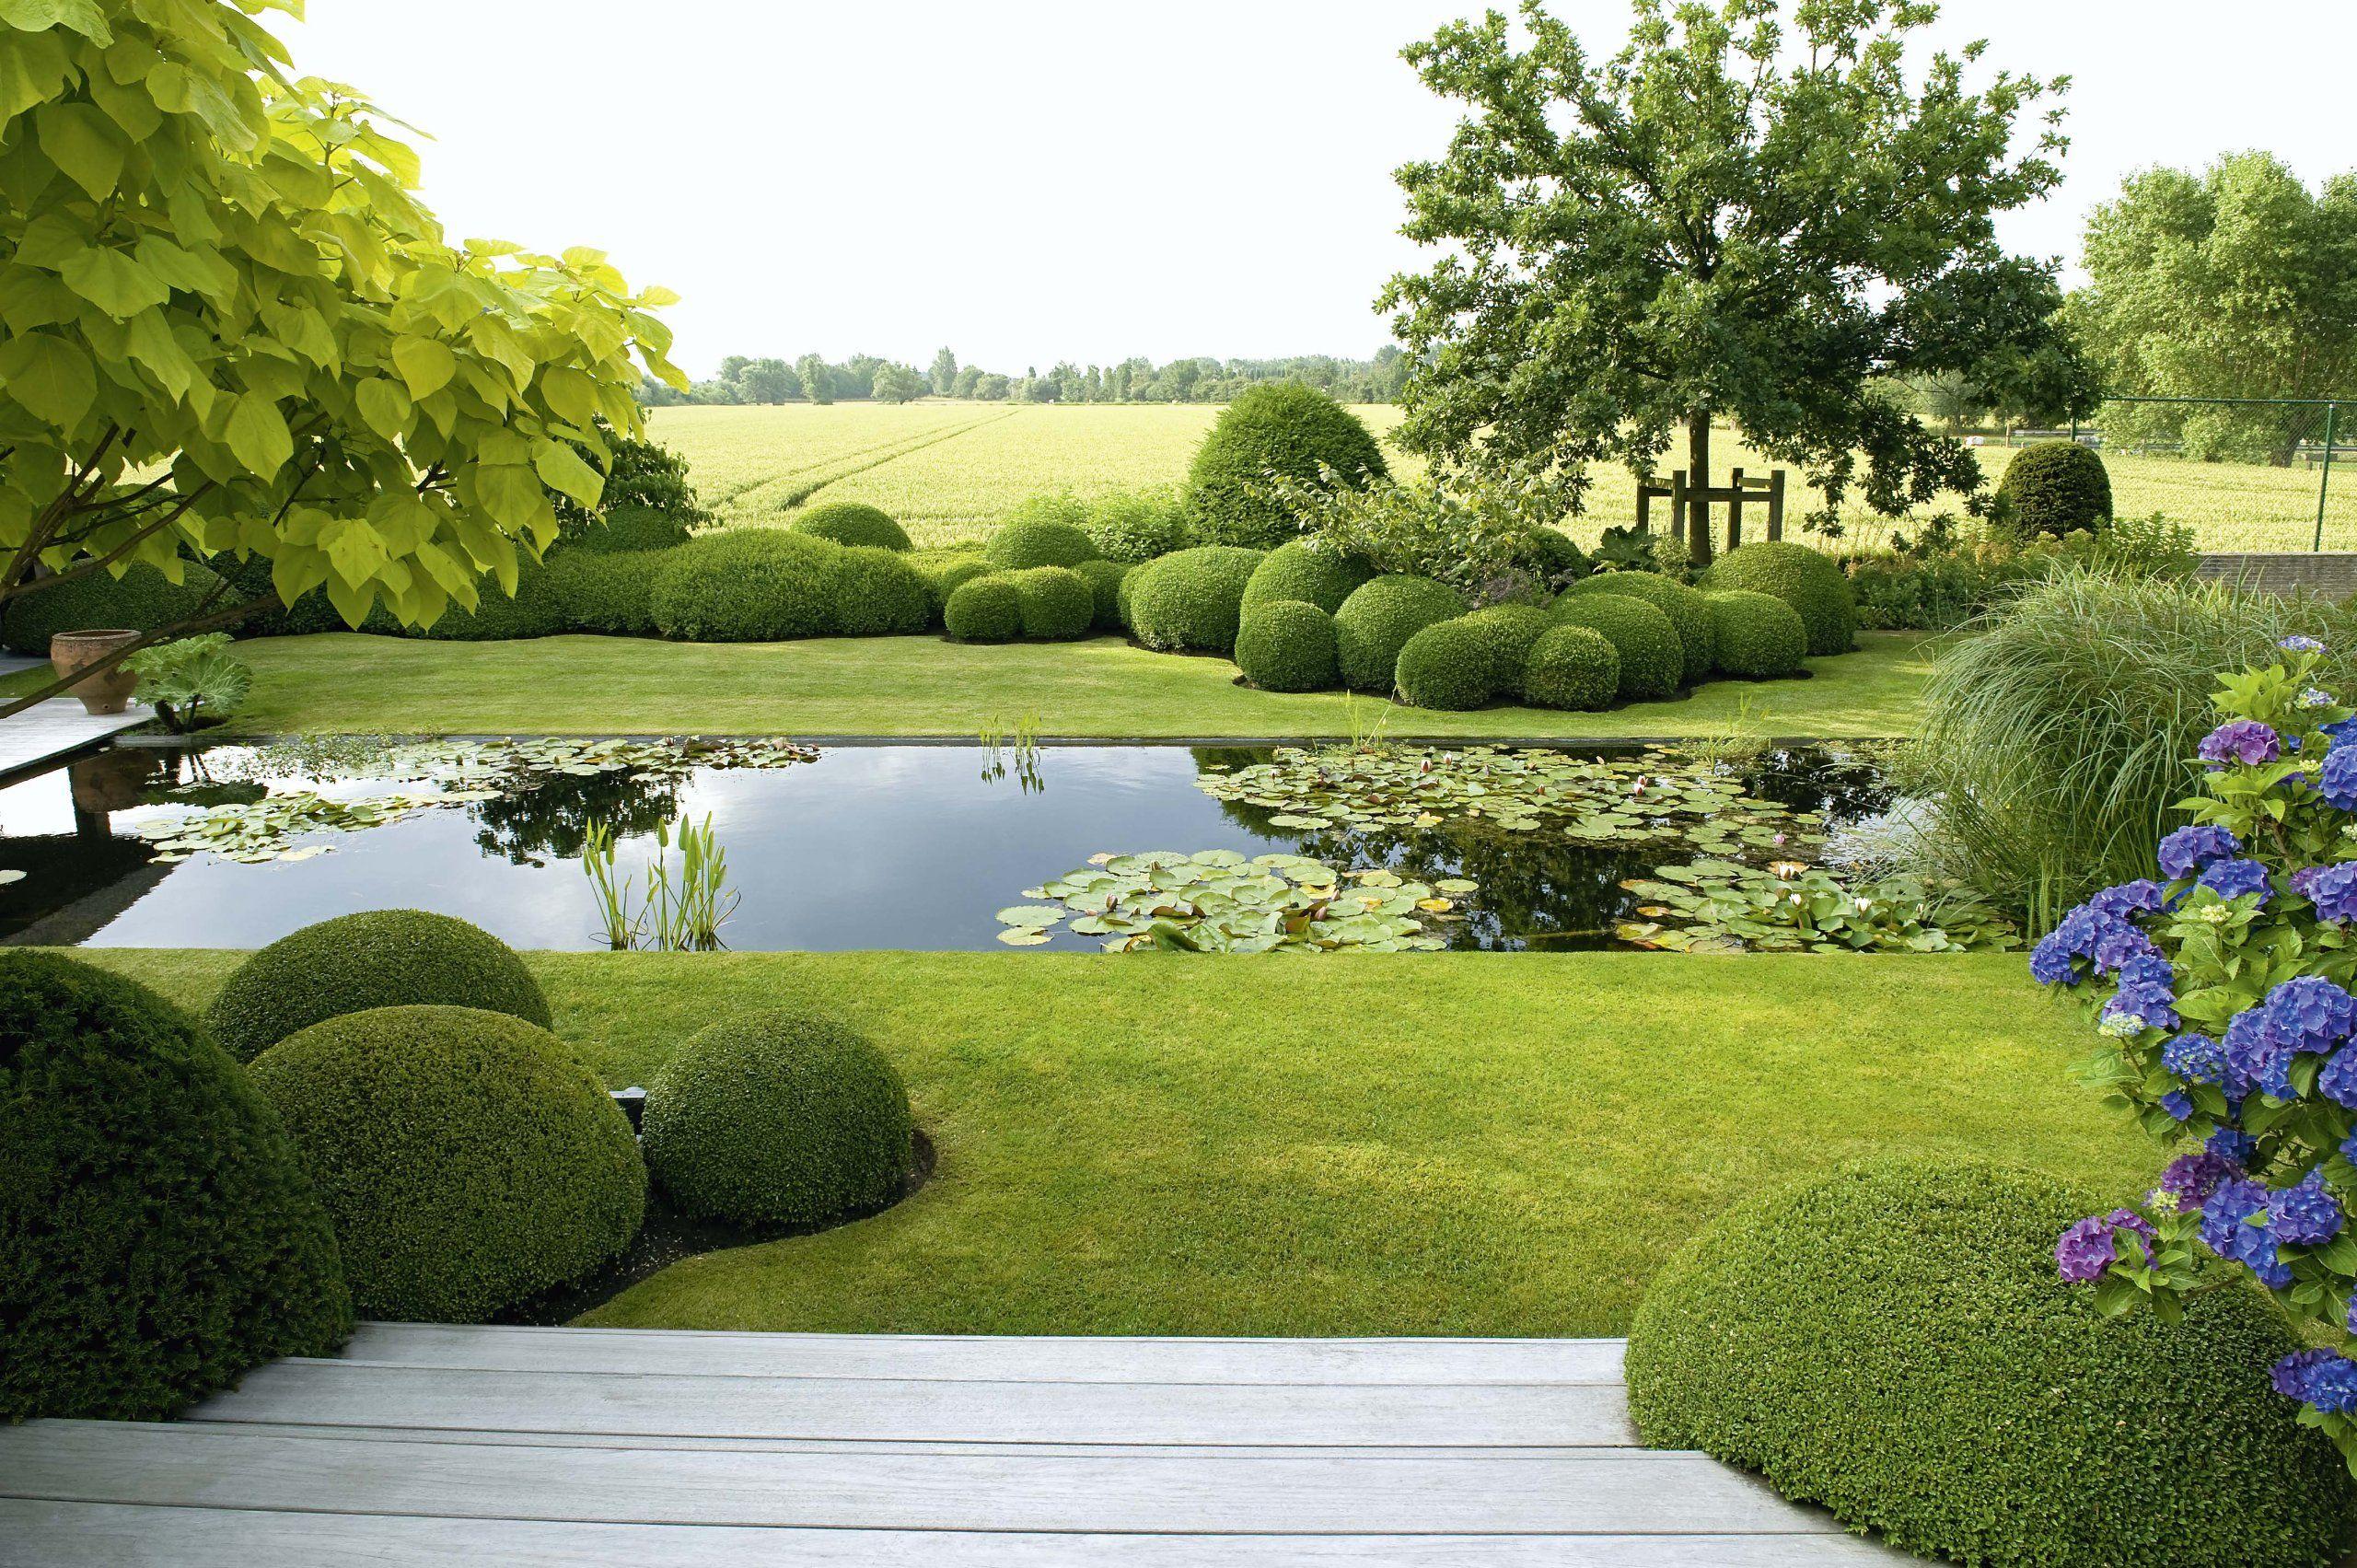 http://www.amazon.de/Exklusives-Gartendesign-Spektakuläre-Ulrich ...